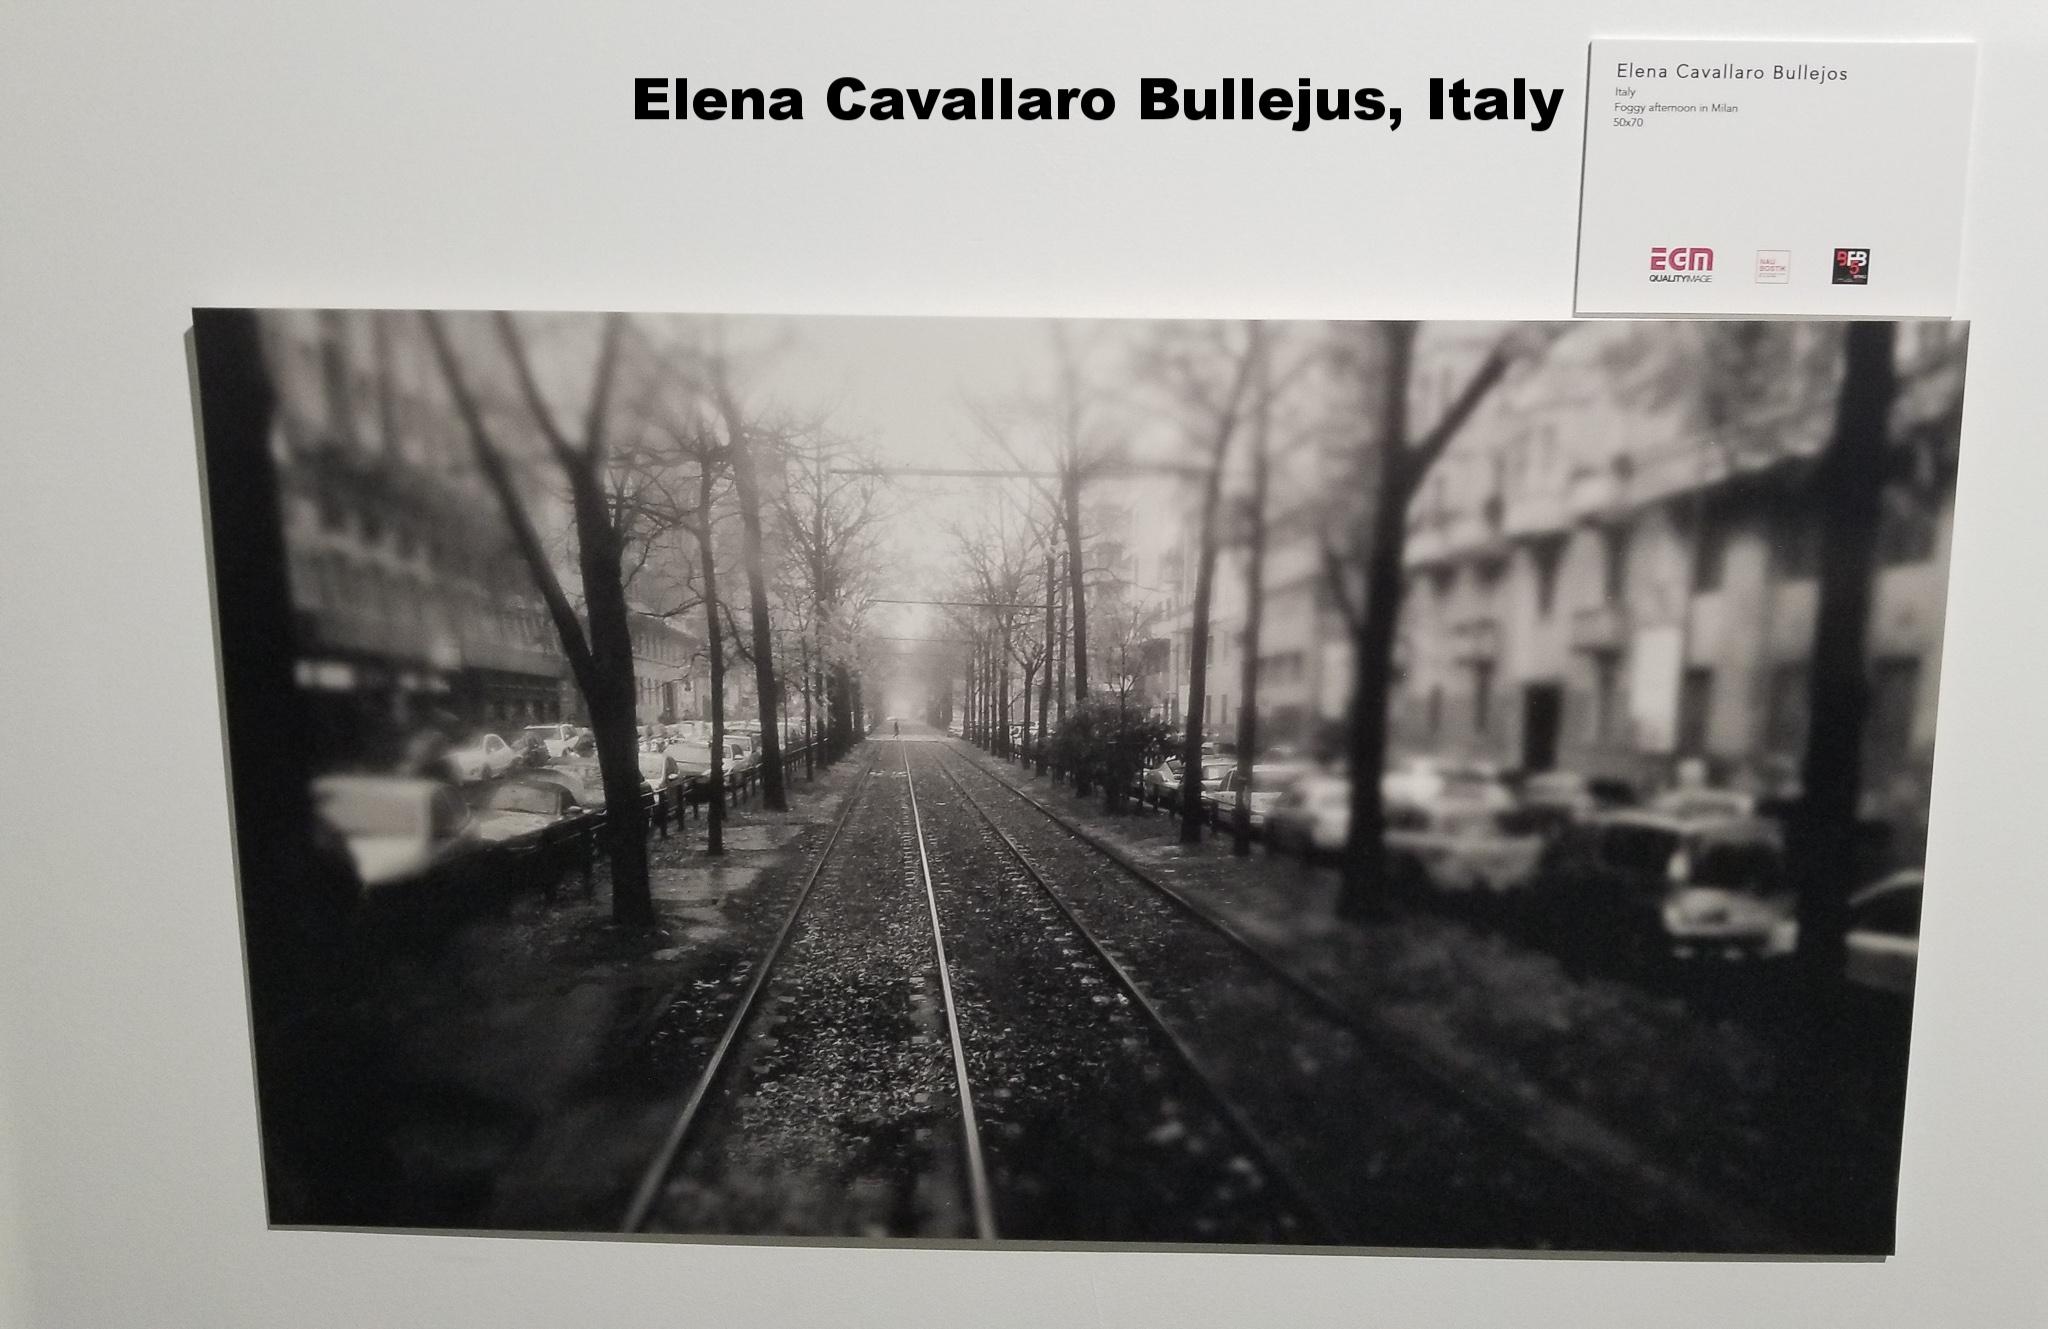 Elena Cavallaro Bullejus, Italy